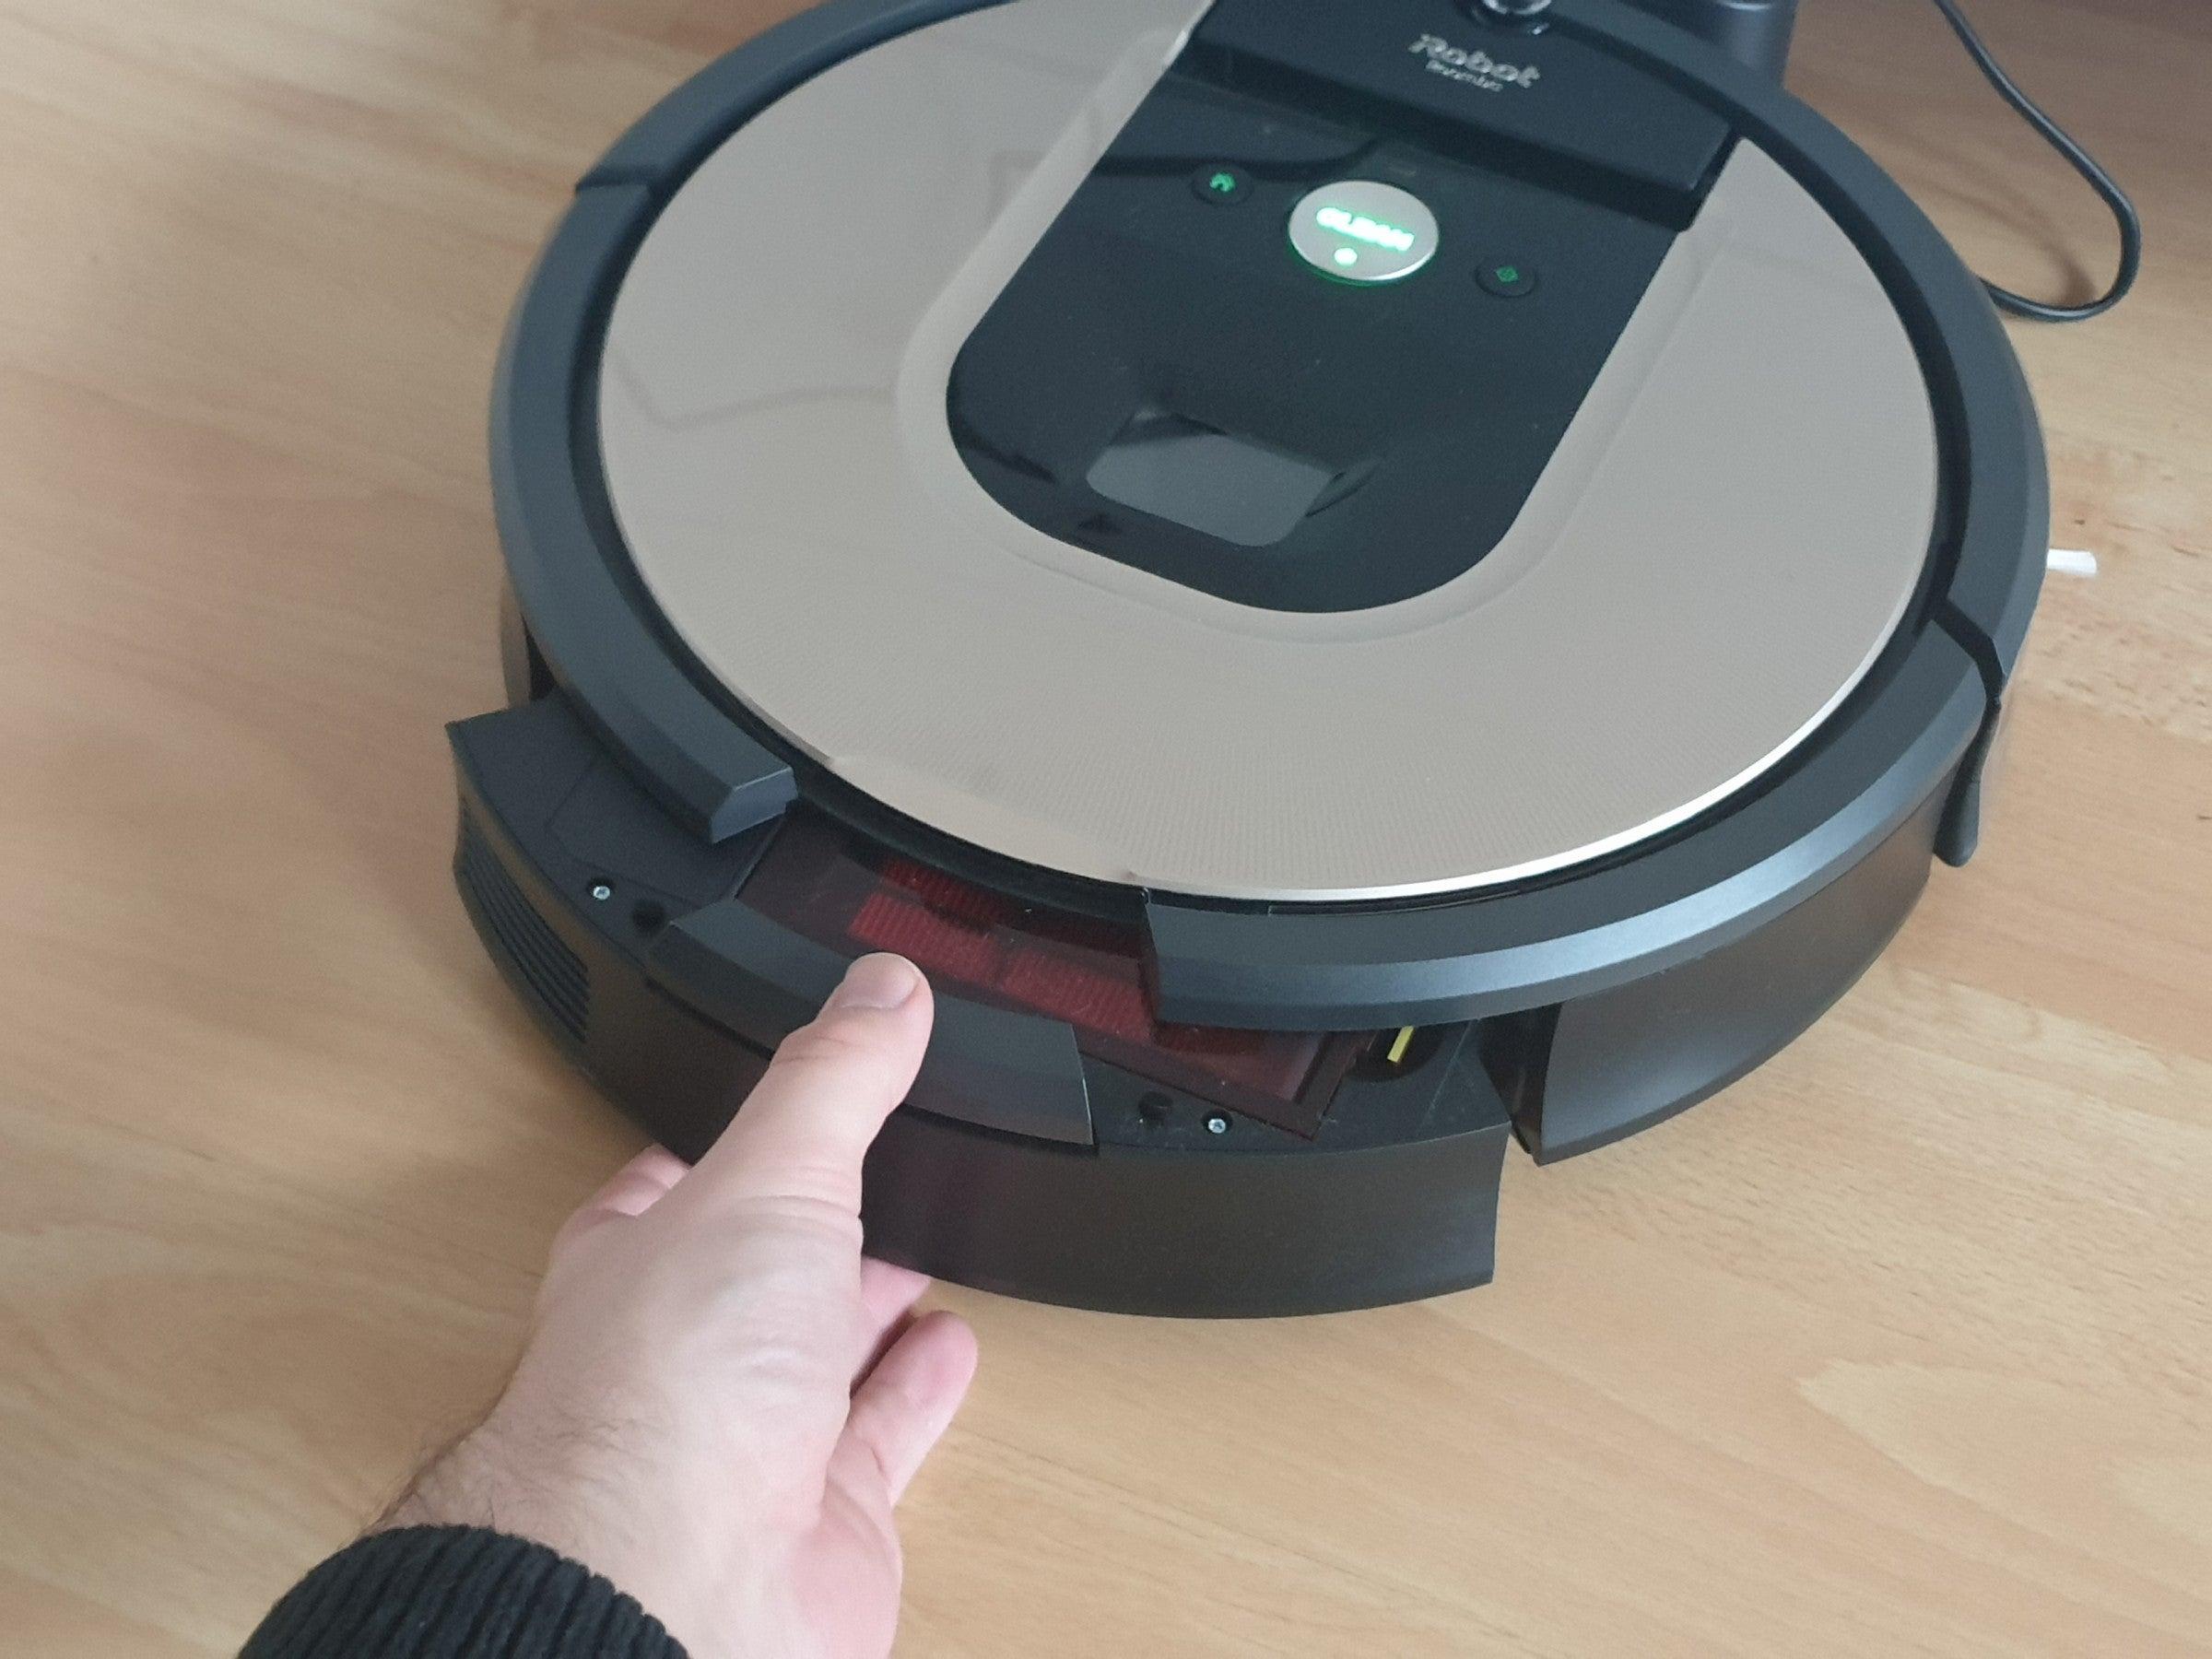 Staubauffangbehälter des Roomba 966 Saugroboters